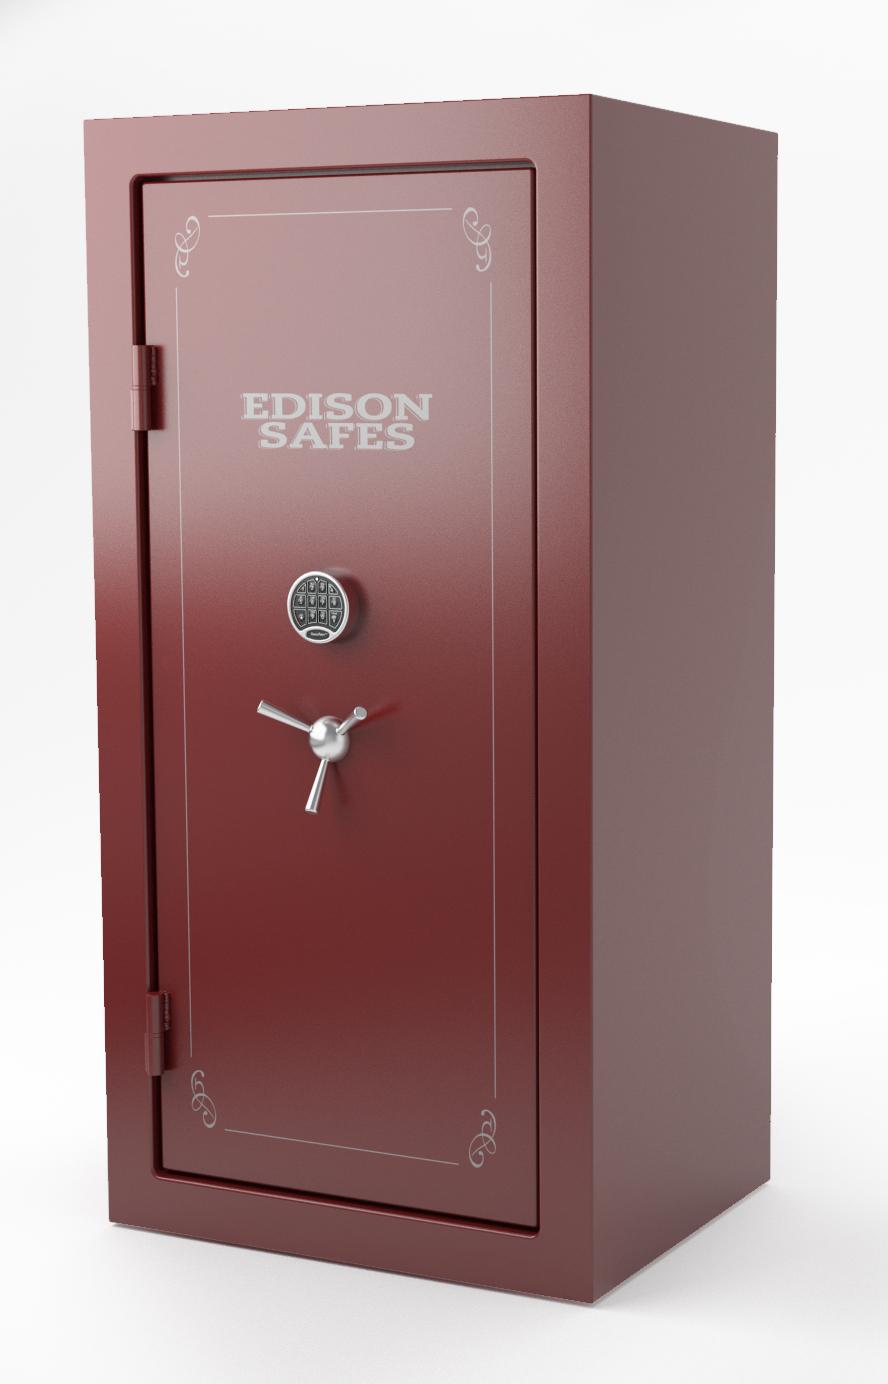 Edison Safes F7236 Foraker Series 30 120 Minute Fire